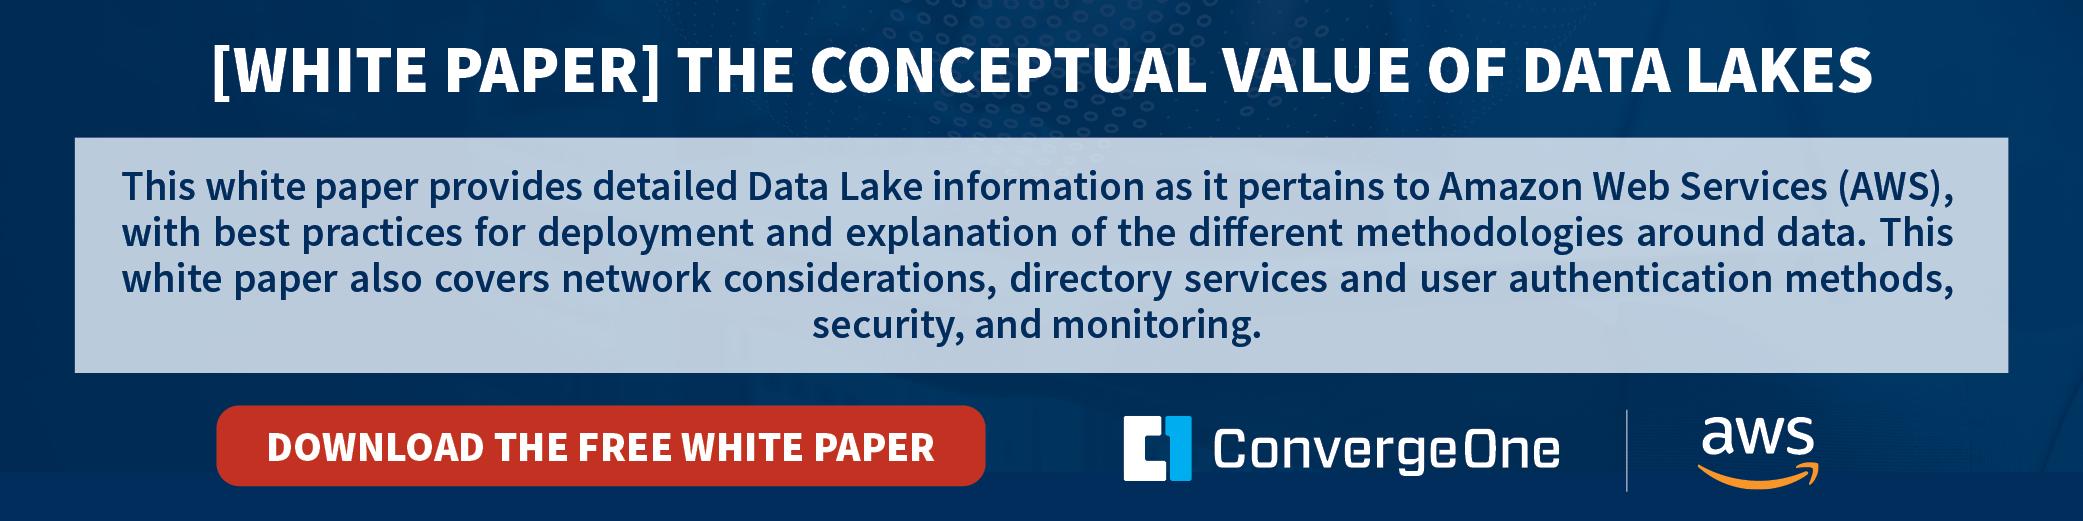 Data Lakes White Paper